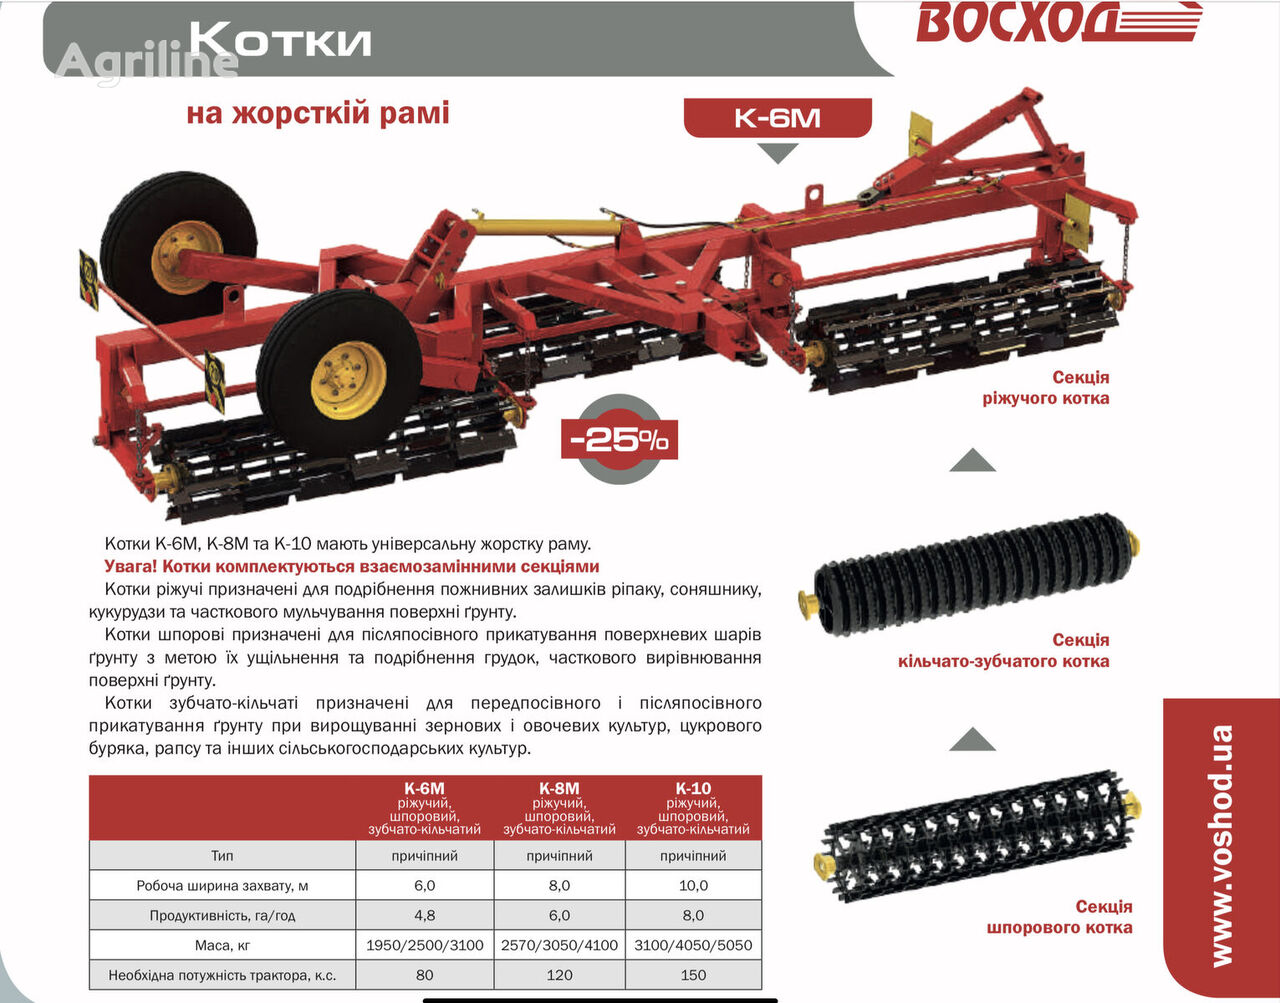 new Voshod K-6M K-8M K-10 field roller